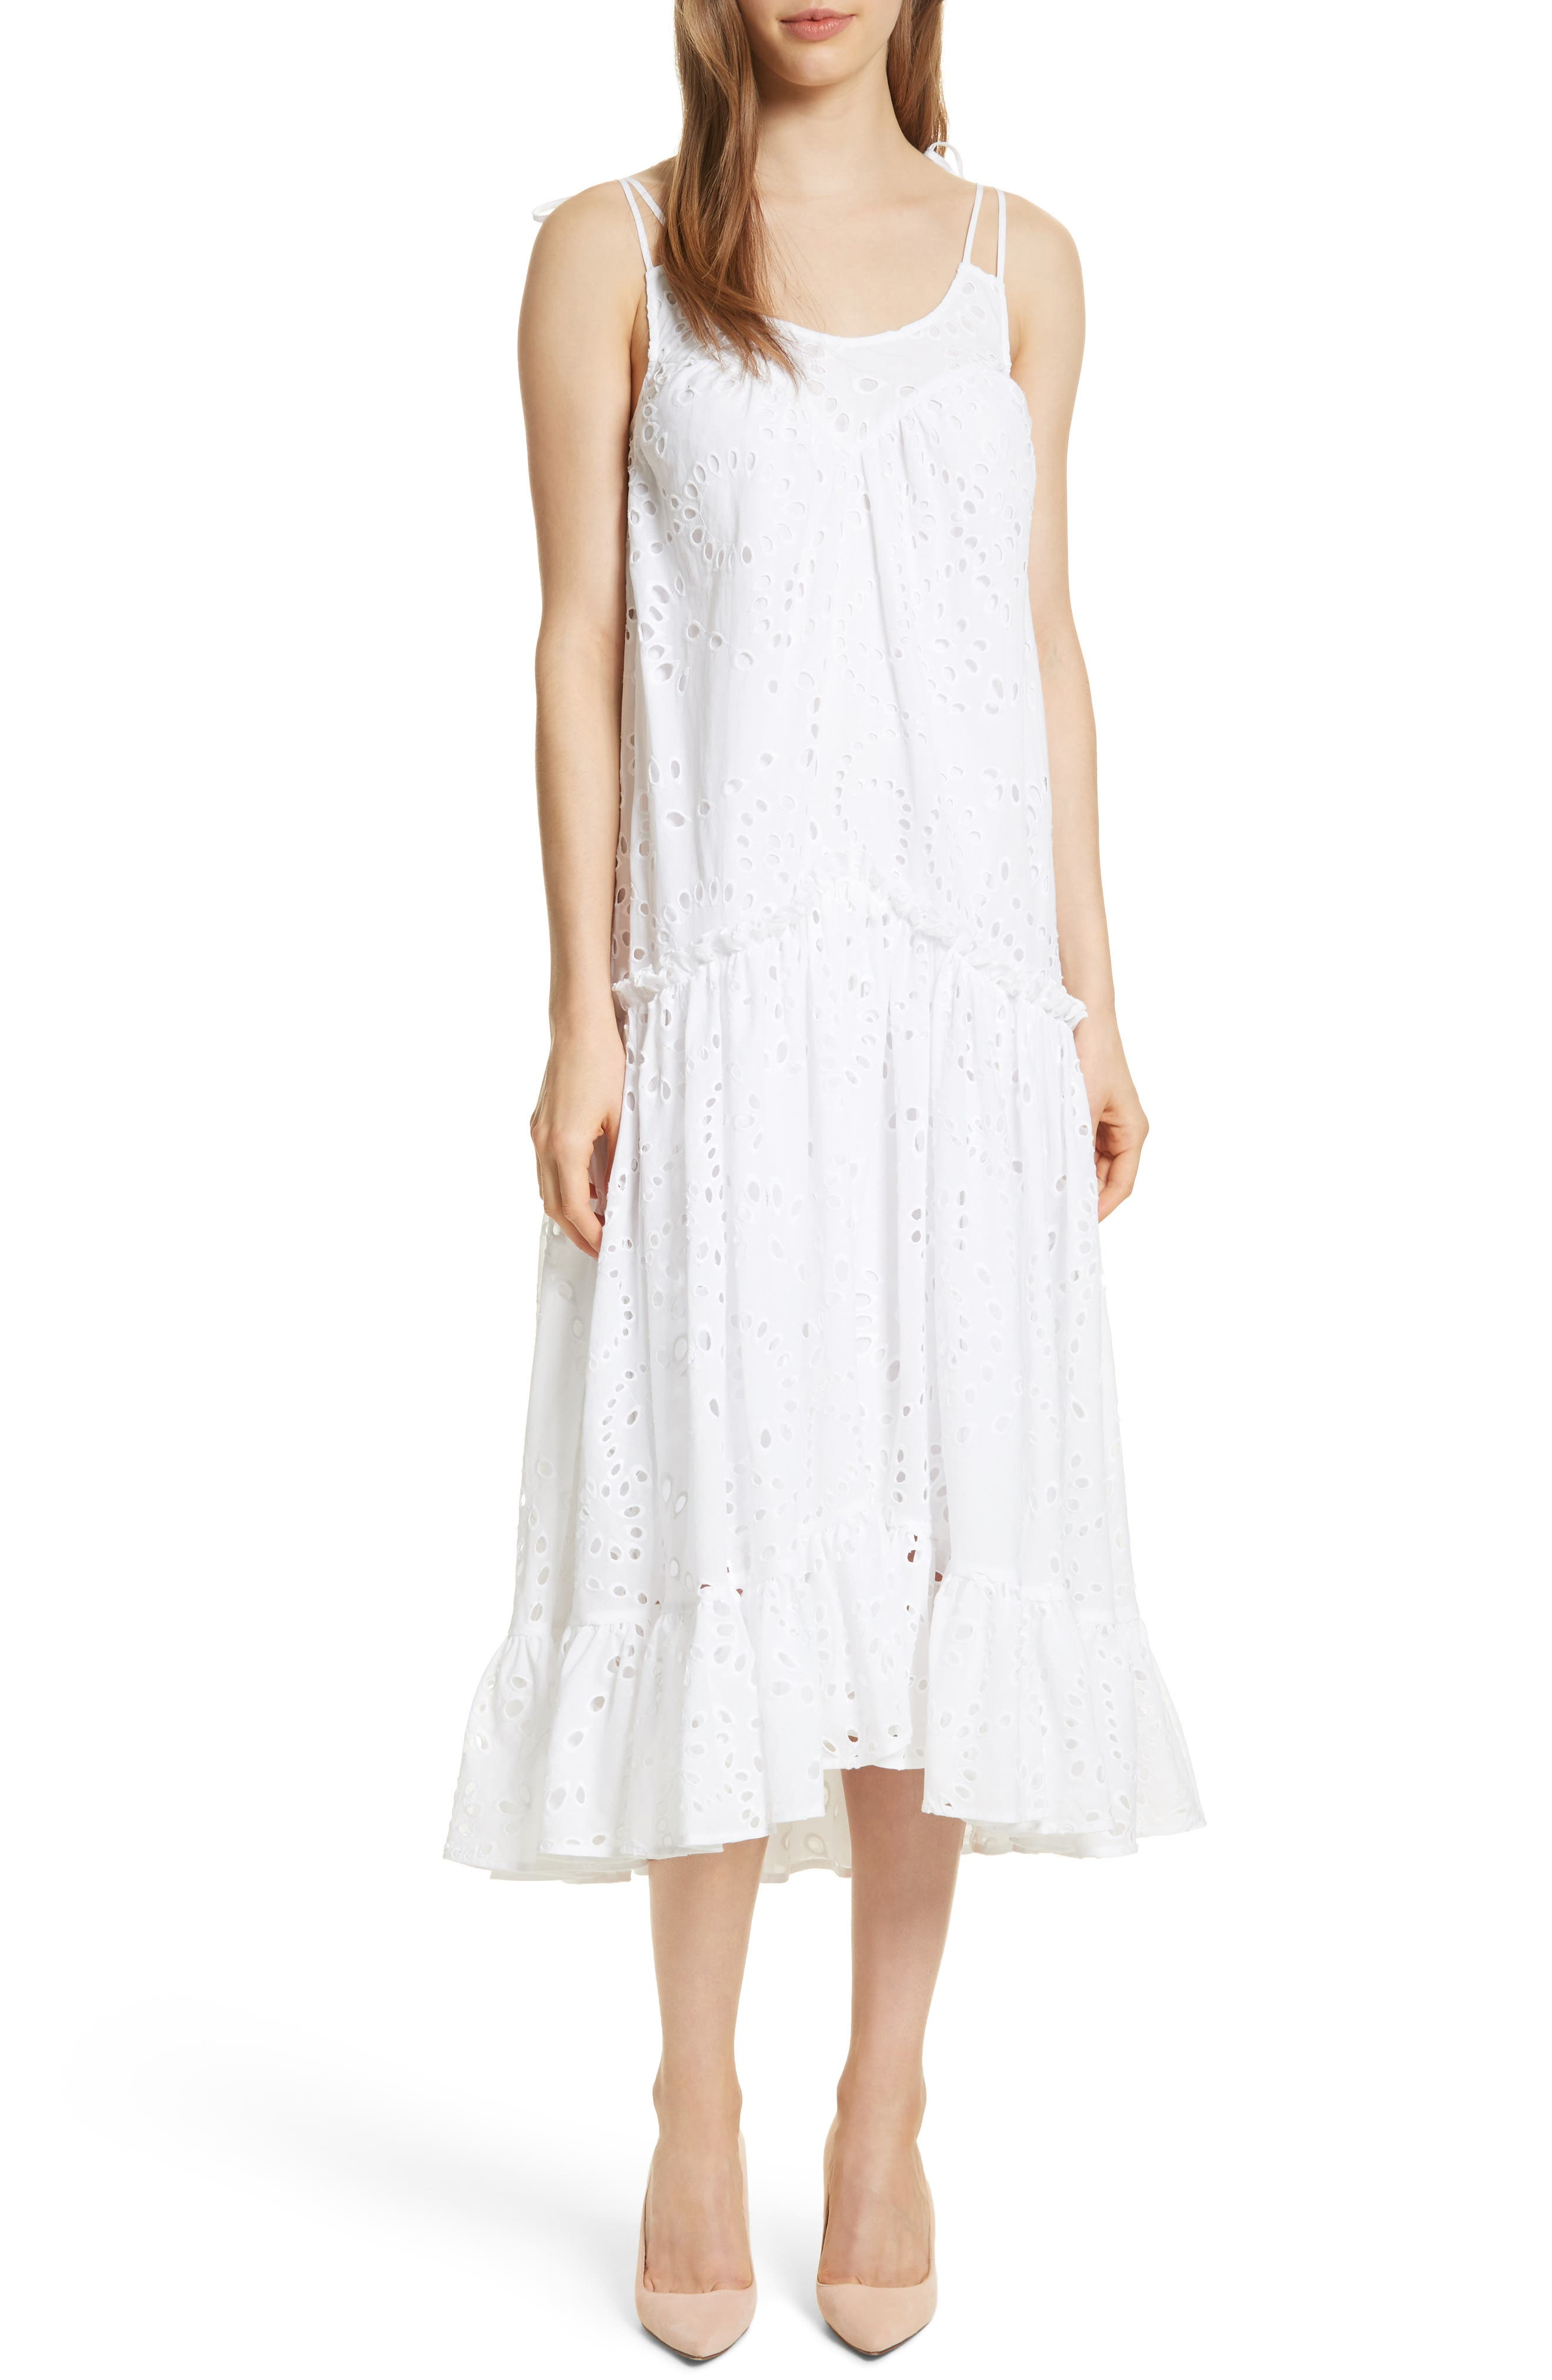 Prose & Poetry Kerr Eyelet Peasant Midi Dress,                         Main,                         color, Cloud White